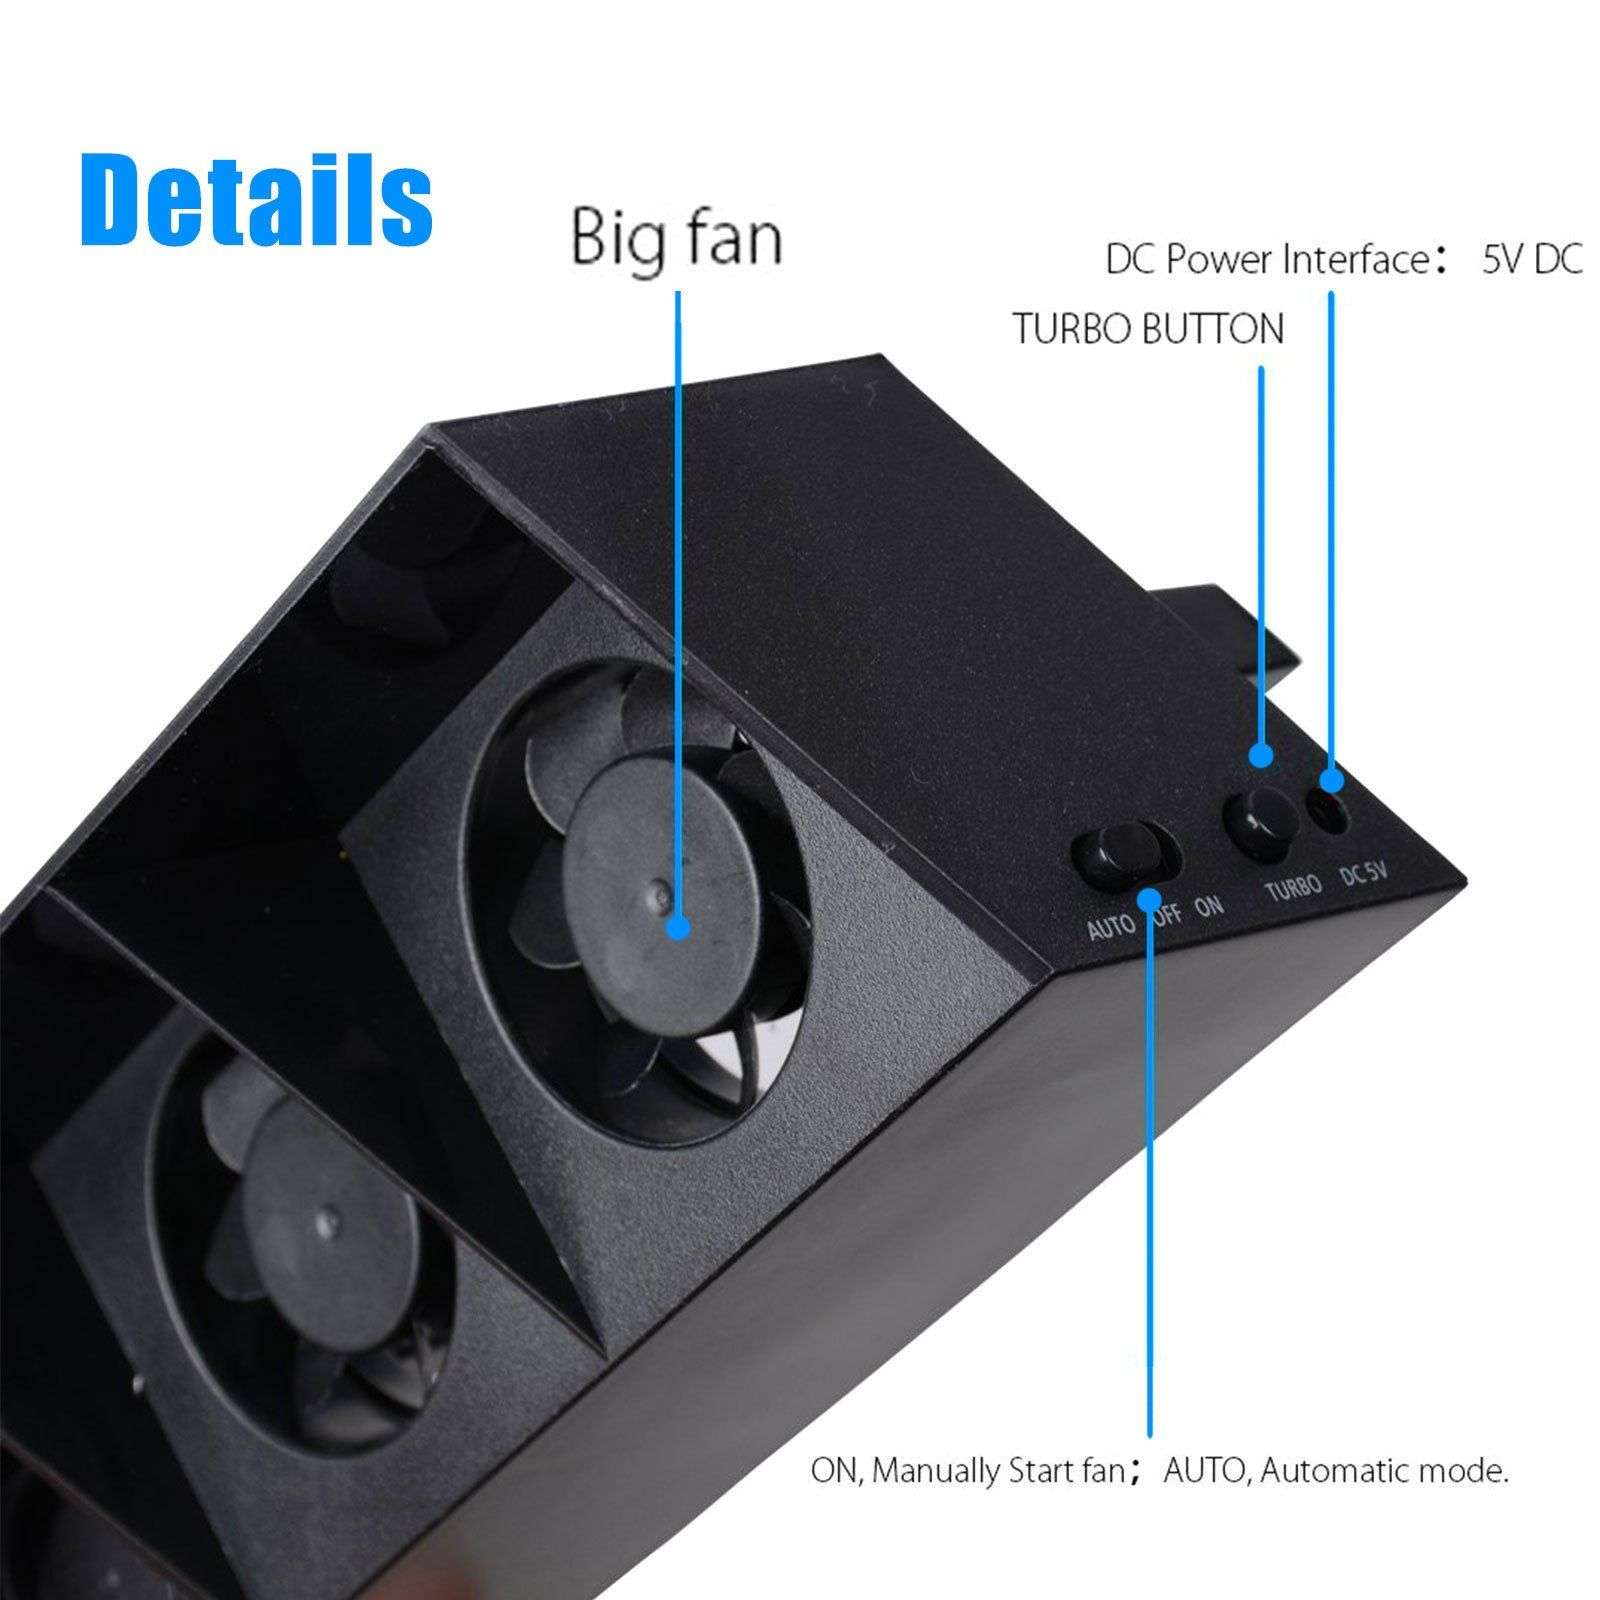 Ps4 Cooler Fan Sqdeal U S Warranty Smart Thermostat External